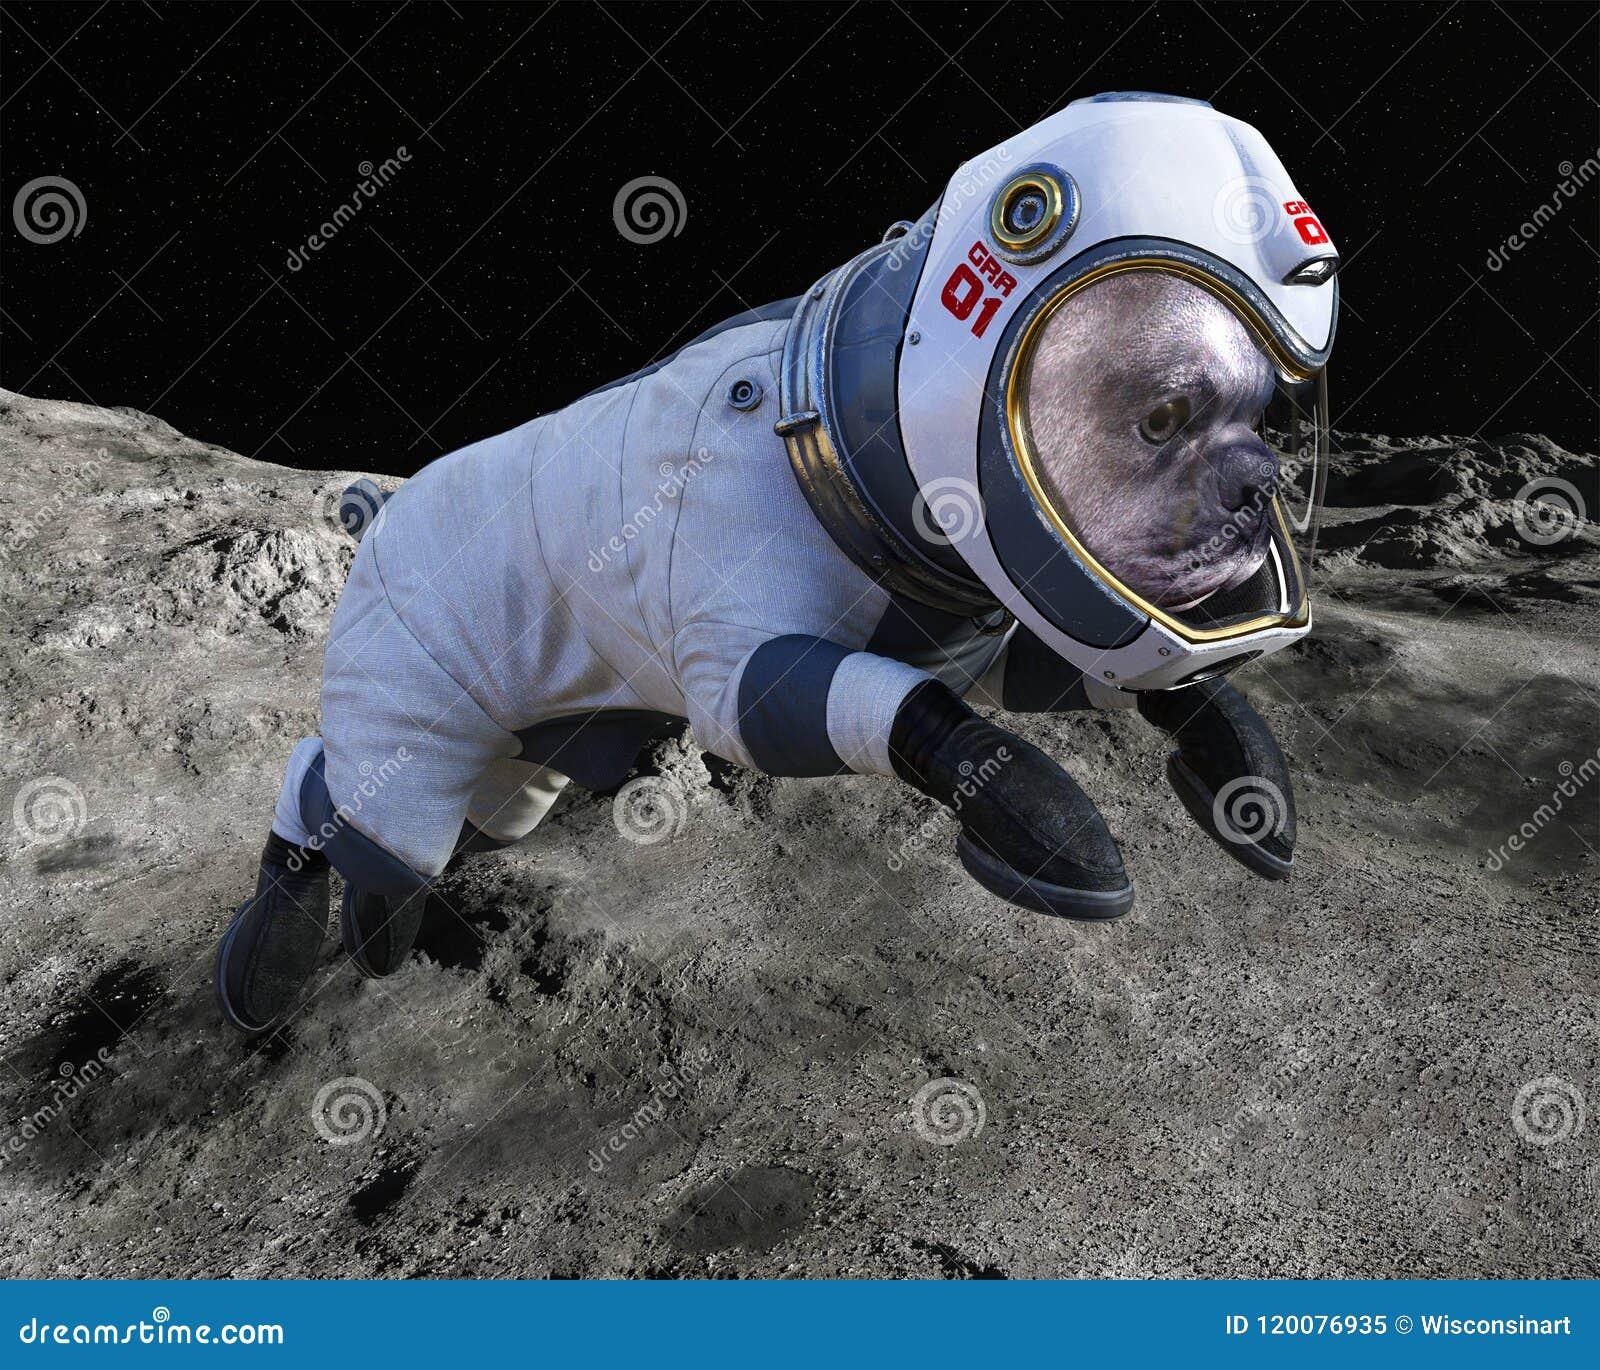 Space Dog, Moon Walk, Astronaut, Lunar Surface Stock Image - Image